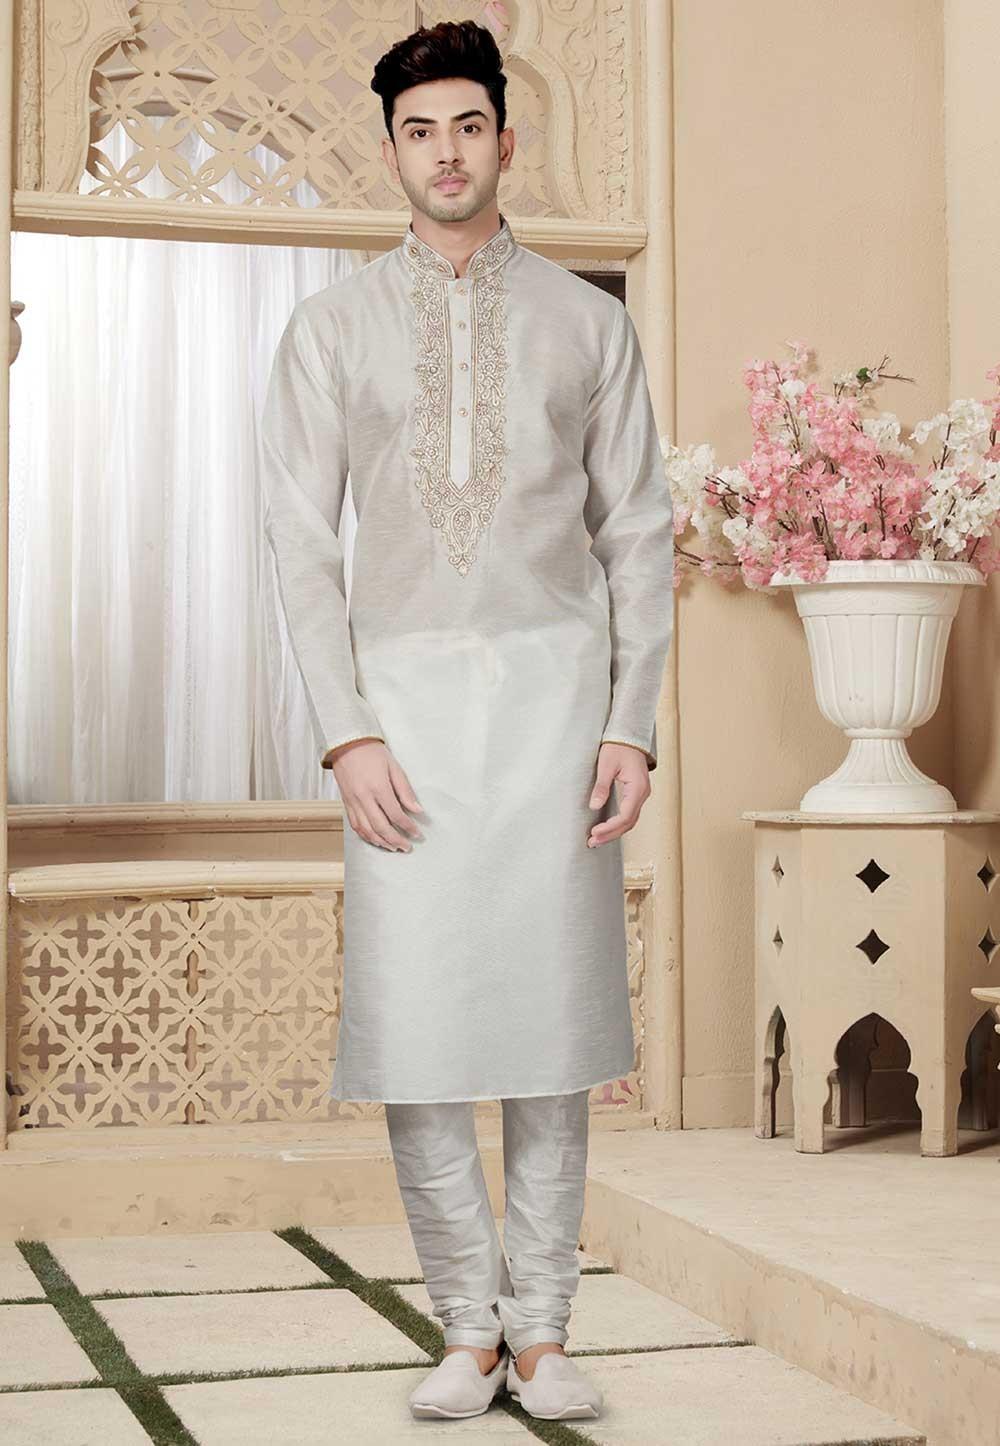 Buy Off White Color Readymade Designer Kurta Pajama for Weddings